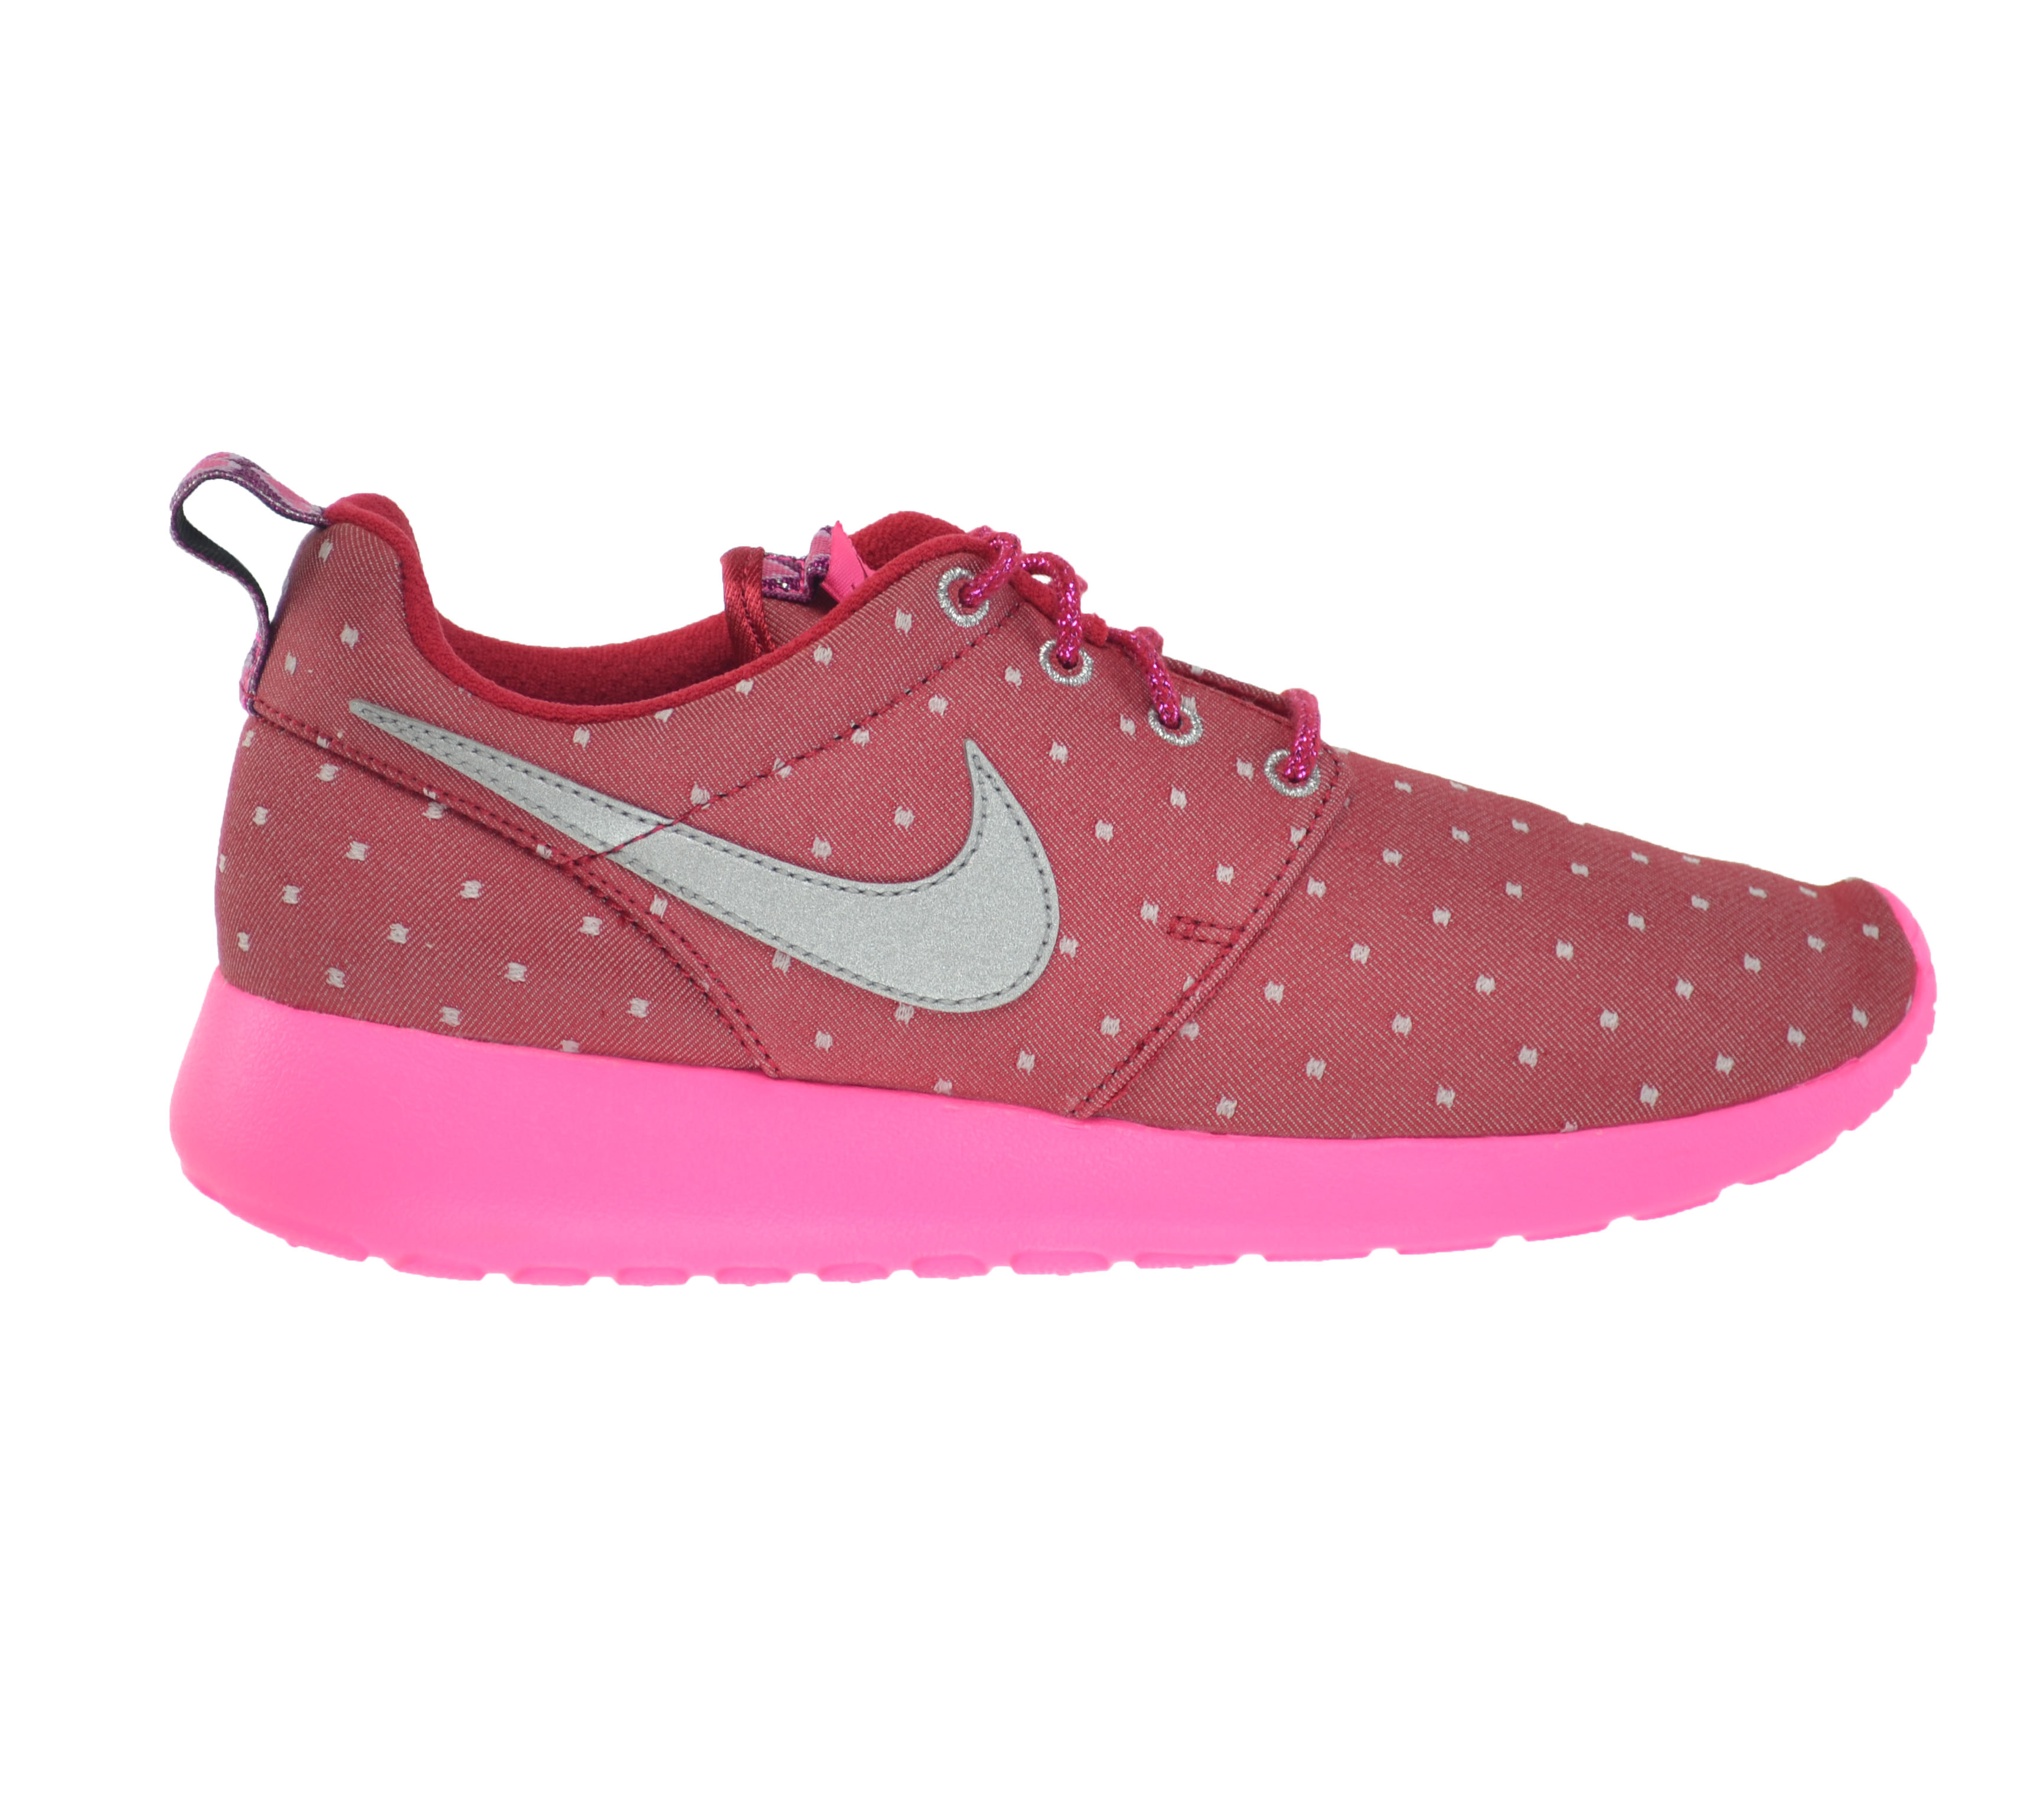 Details about Nike Rosherun Print (GS) Big Kids Shoes RedSilver Pink White 677784 606